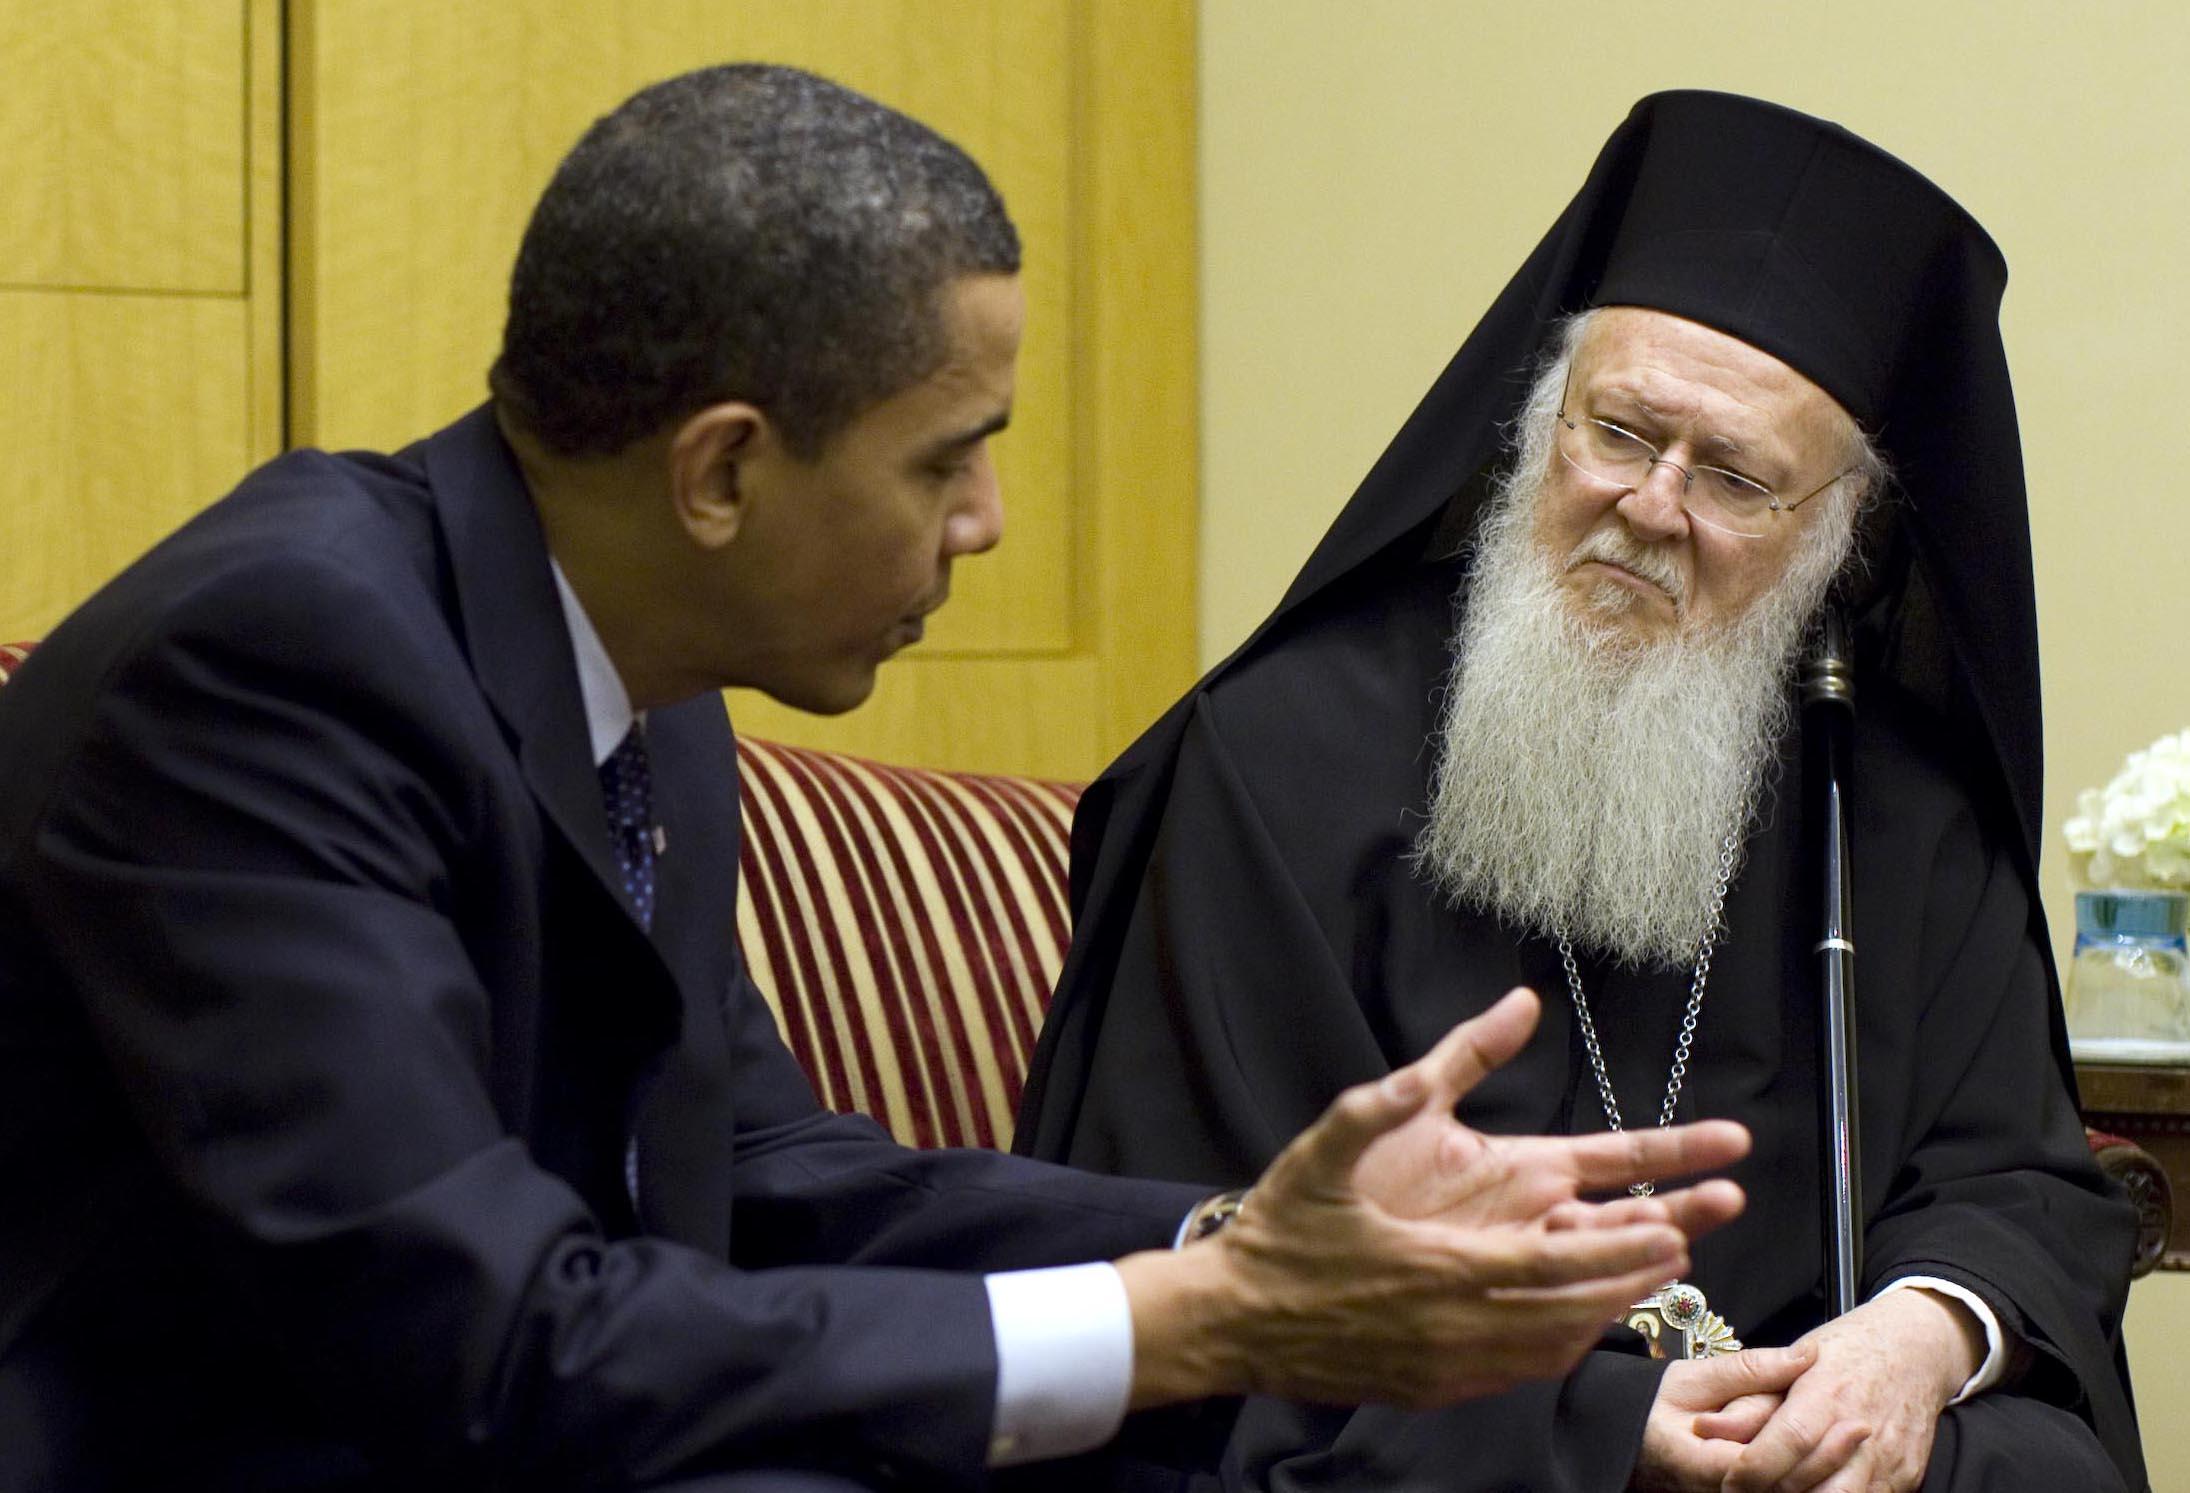 president_barack_obama_meets_with_greek_orthodox_ecumenical_patriarch_bartholomew_i_crop